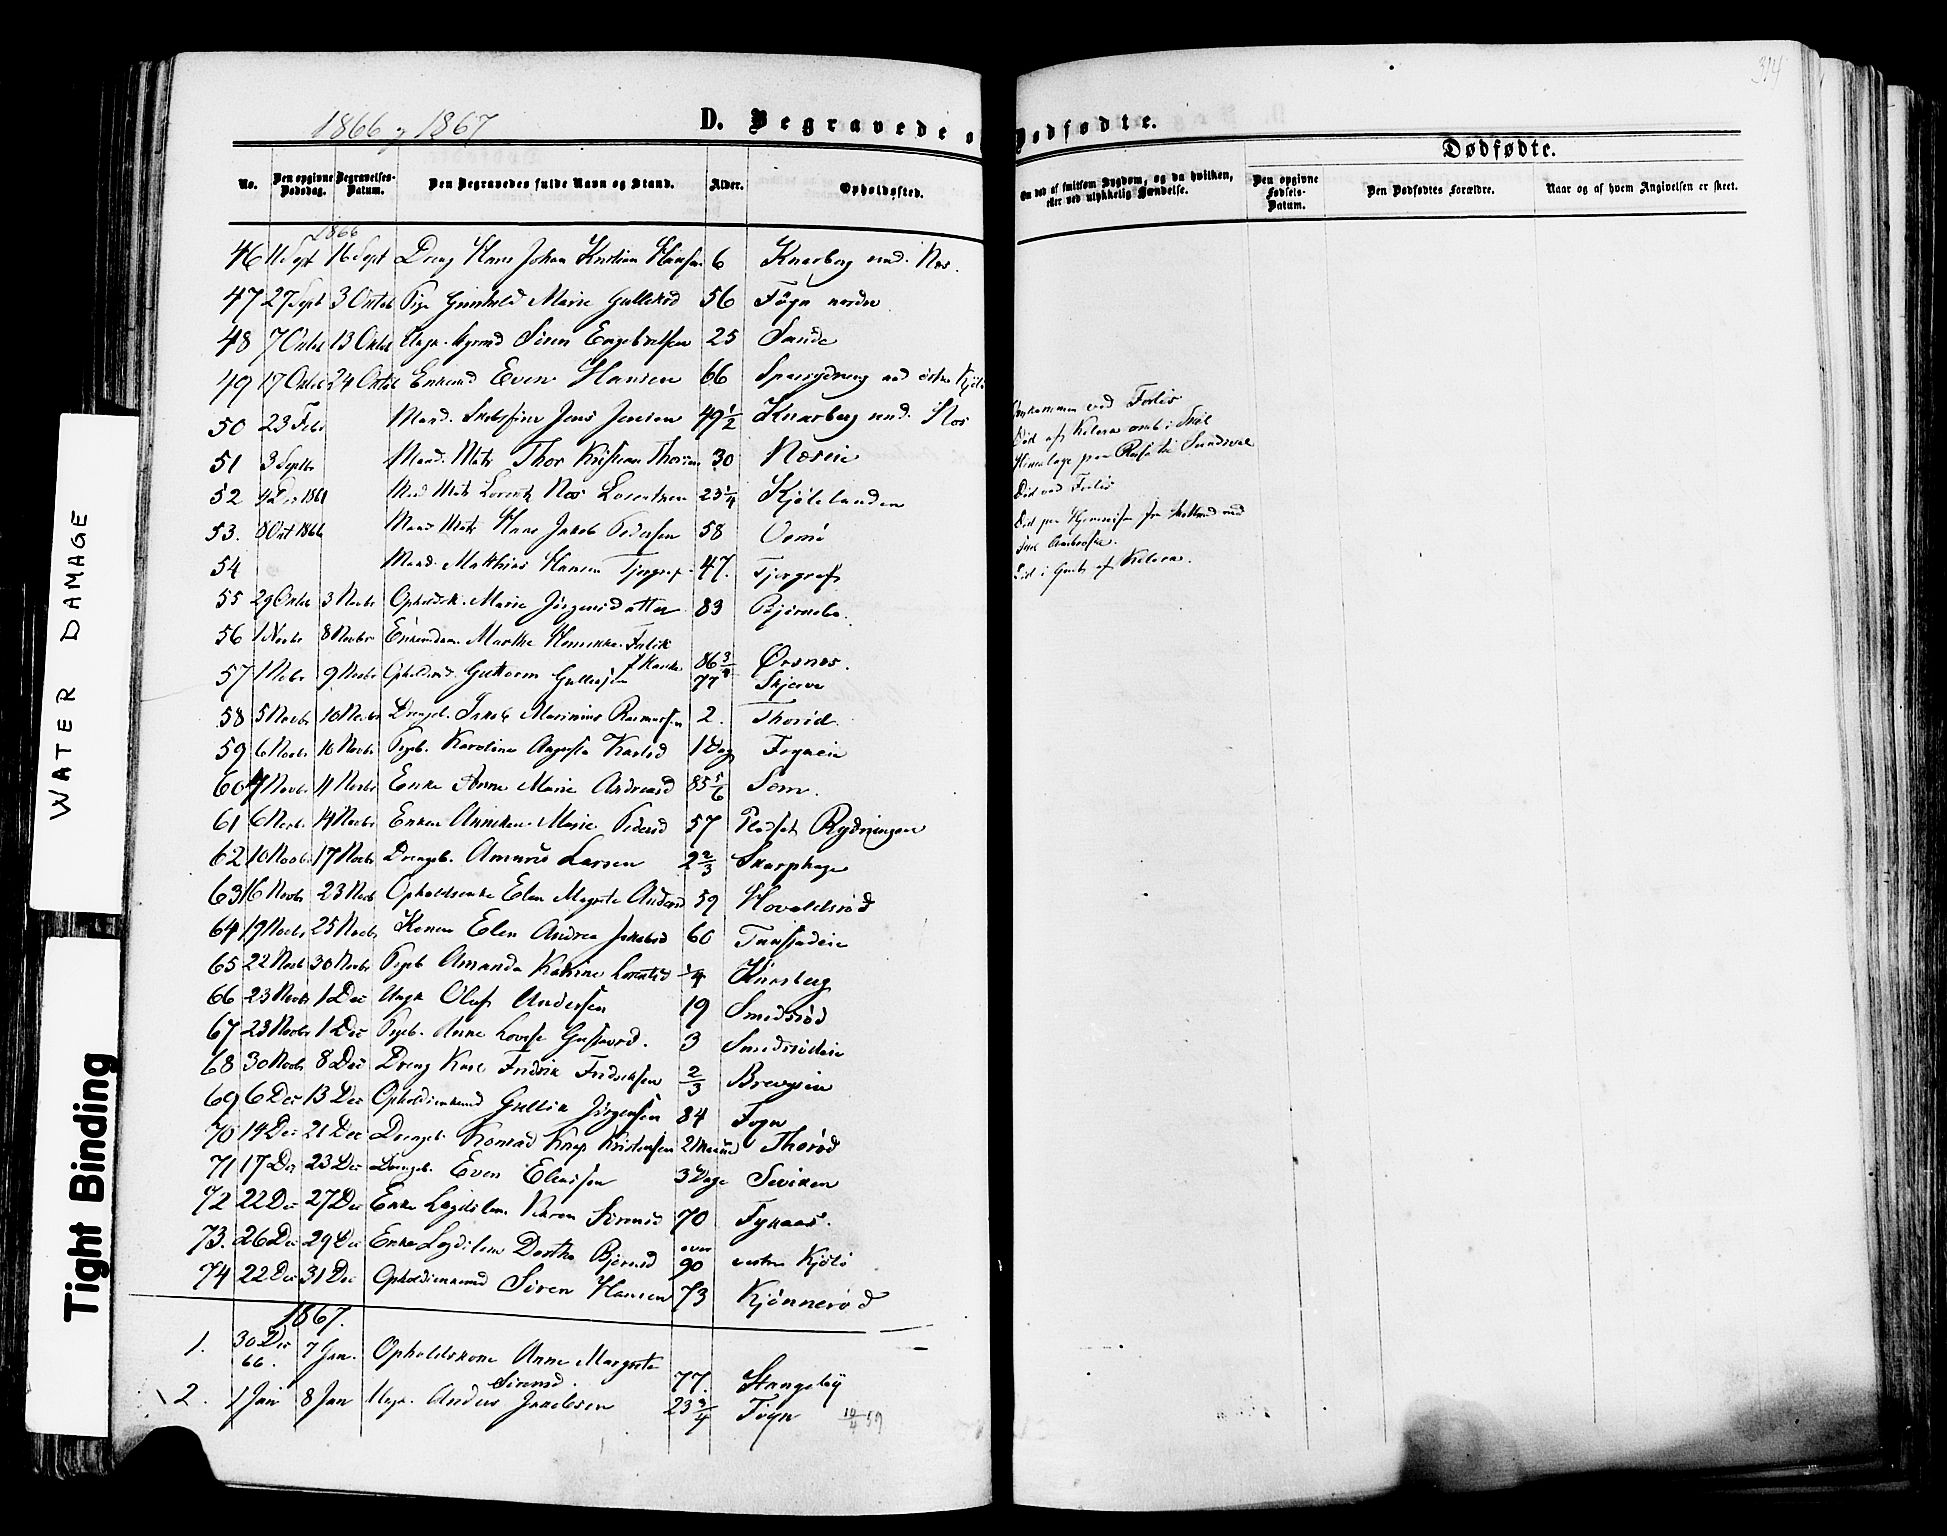 SAKO, Nøtterøy kirkebøker, F/Fa/L0007: Ministerialbok nr. I 7, 1865-1877, s. 314